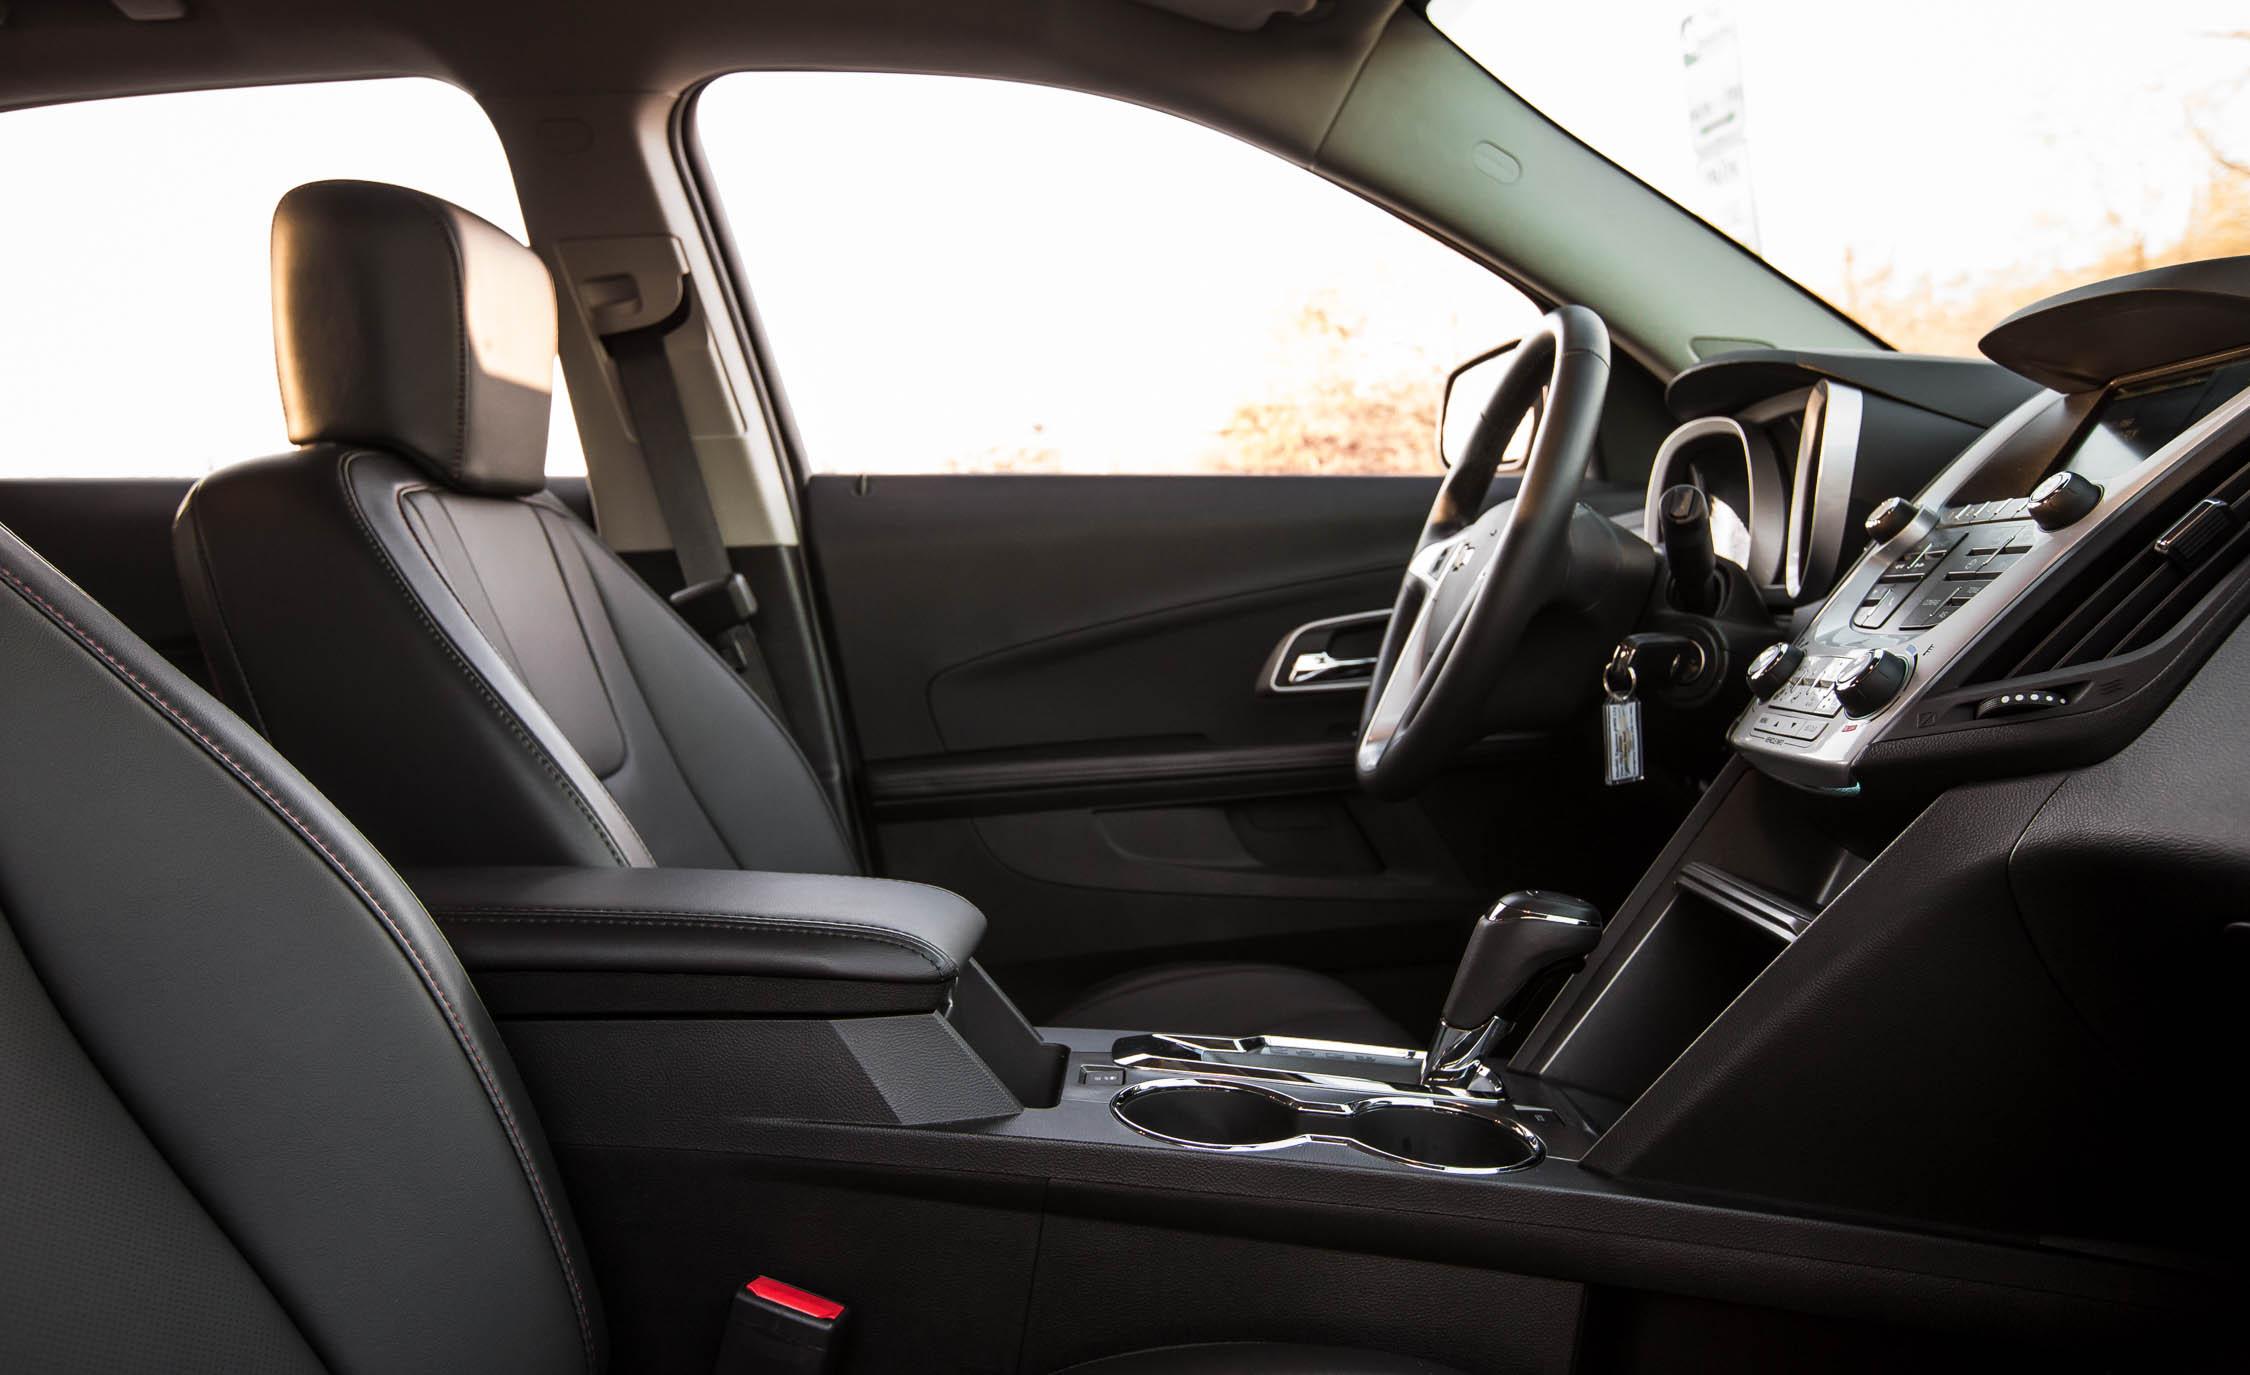 2016 Chevrolet Equinox LTZ (Photo 3 of 25)